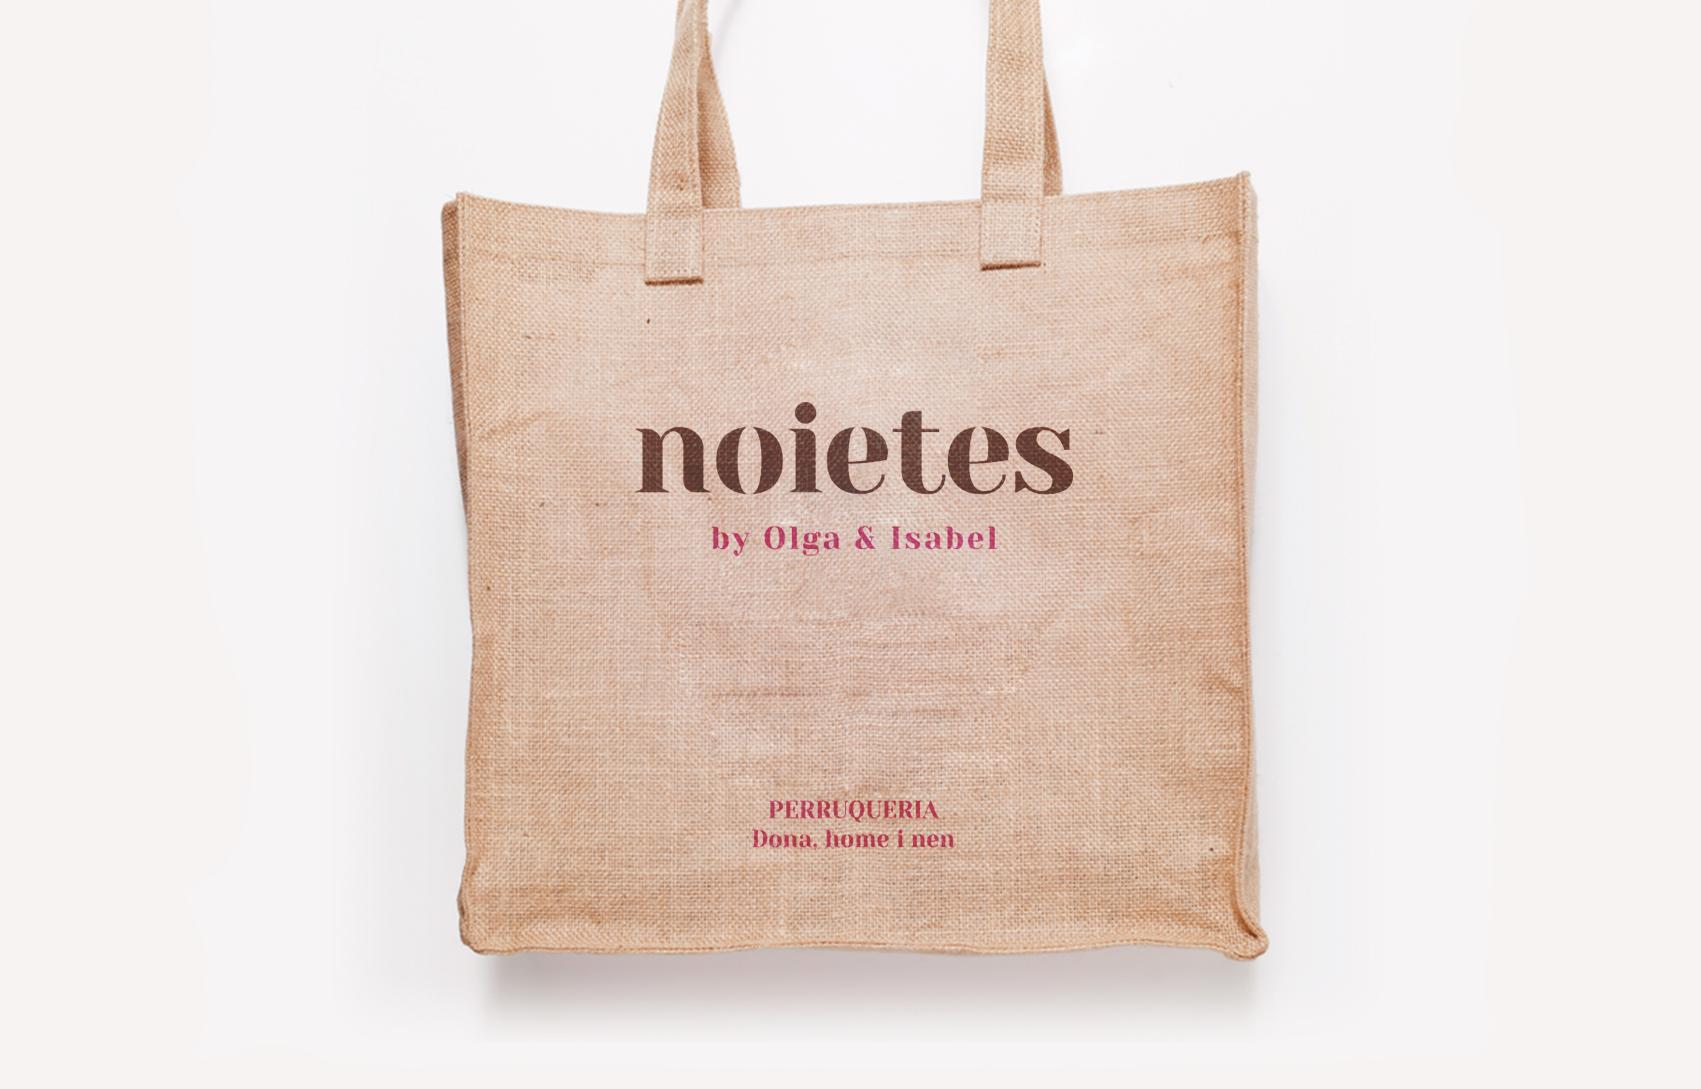 NOIETES_Bossa.jpg